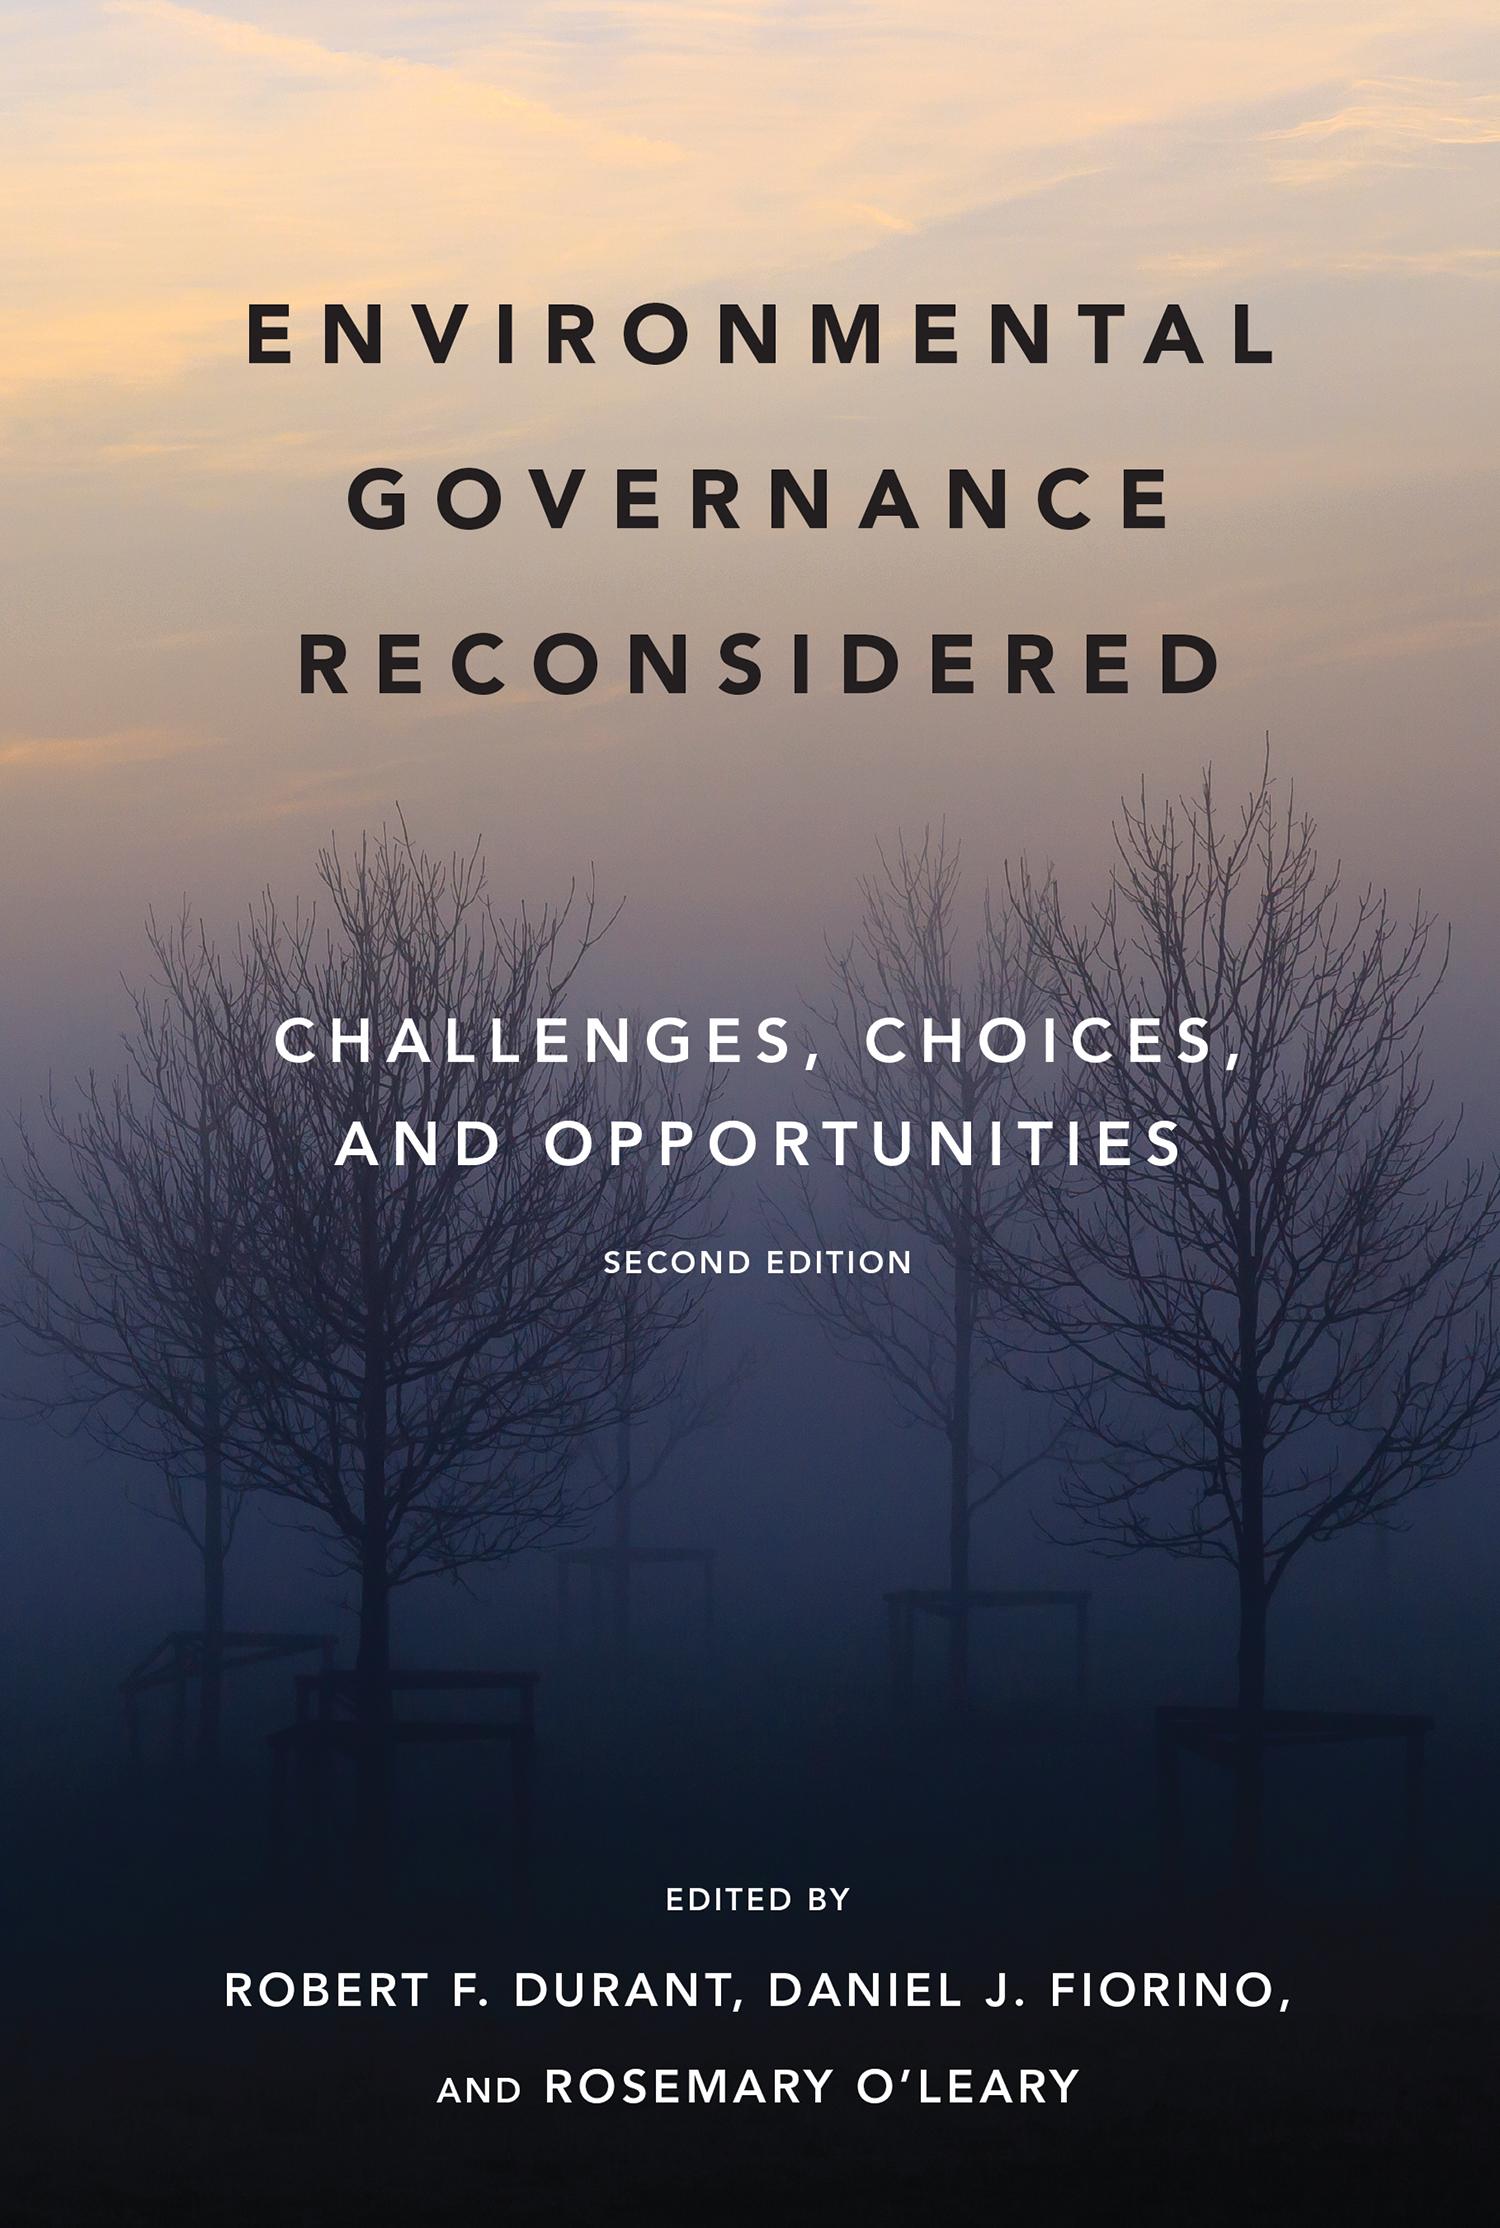 Environmental Governance Reconsidered